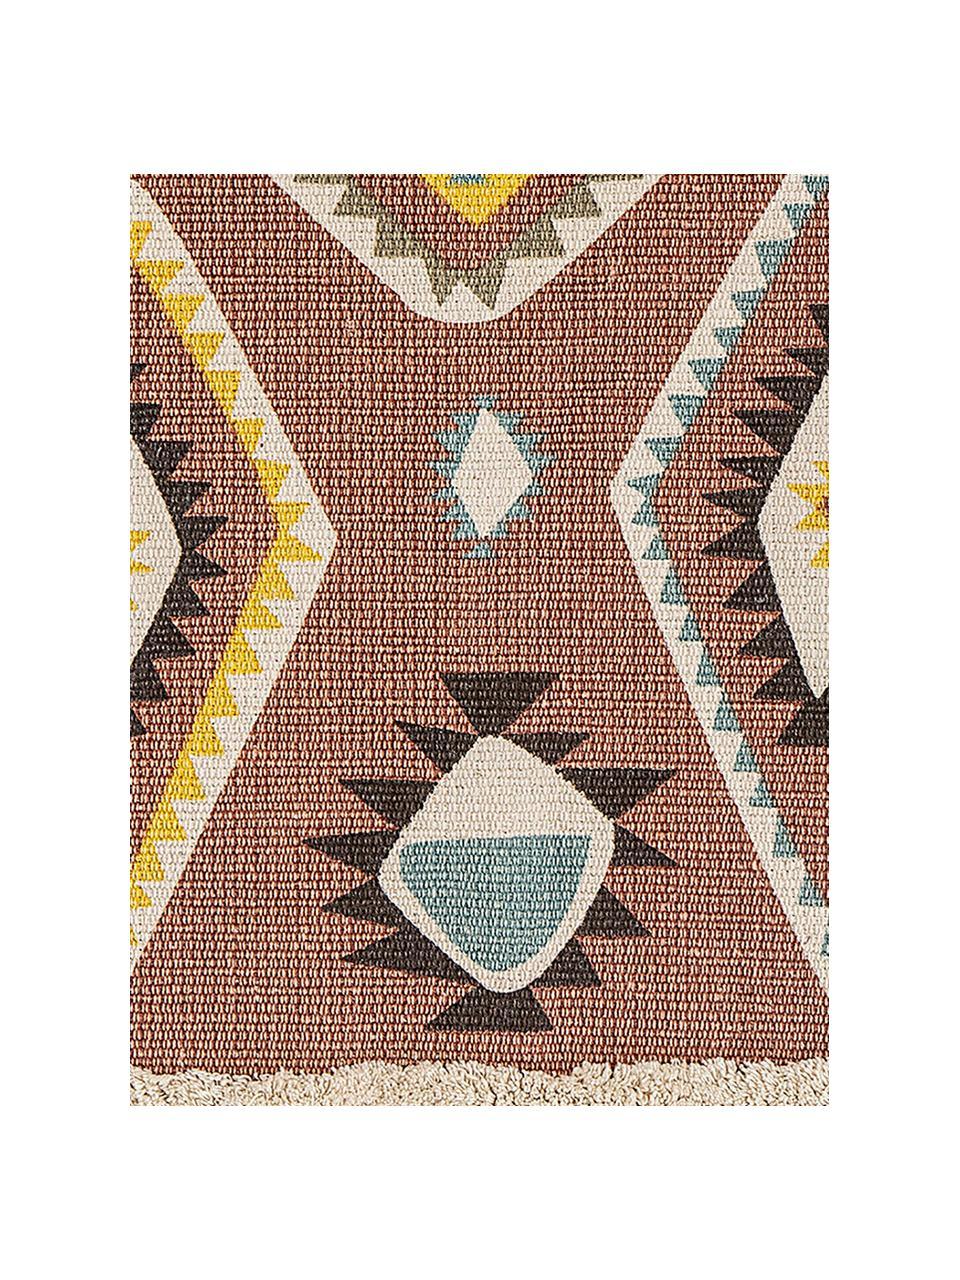 Teppich Boho, 100% Baumwolle, Mehrfarbig, B 70 x L 120 cm (Größe XS)